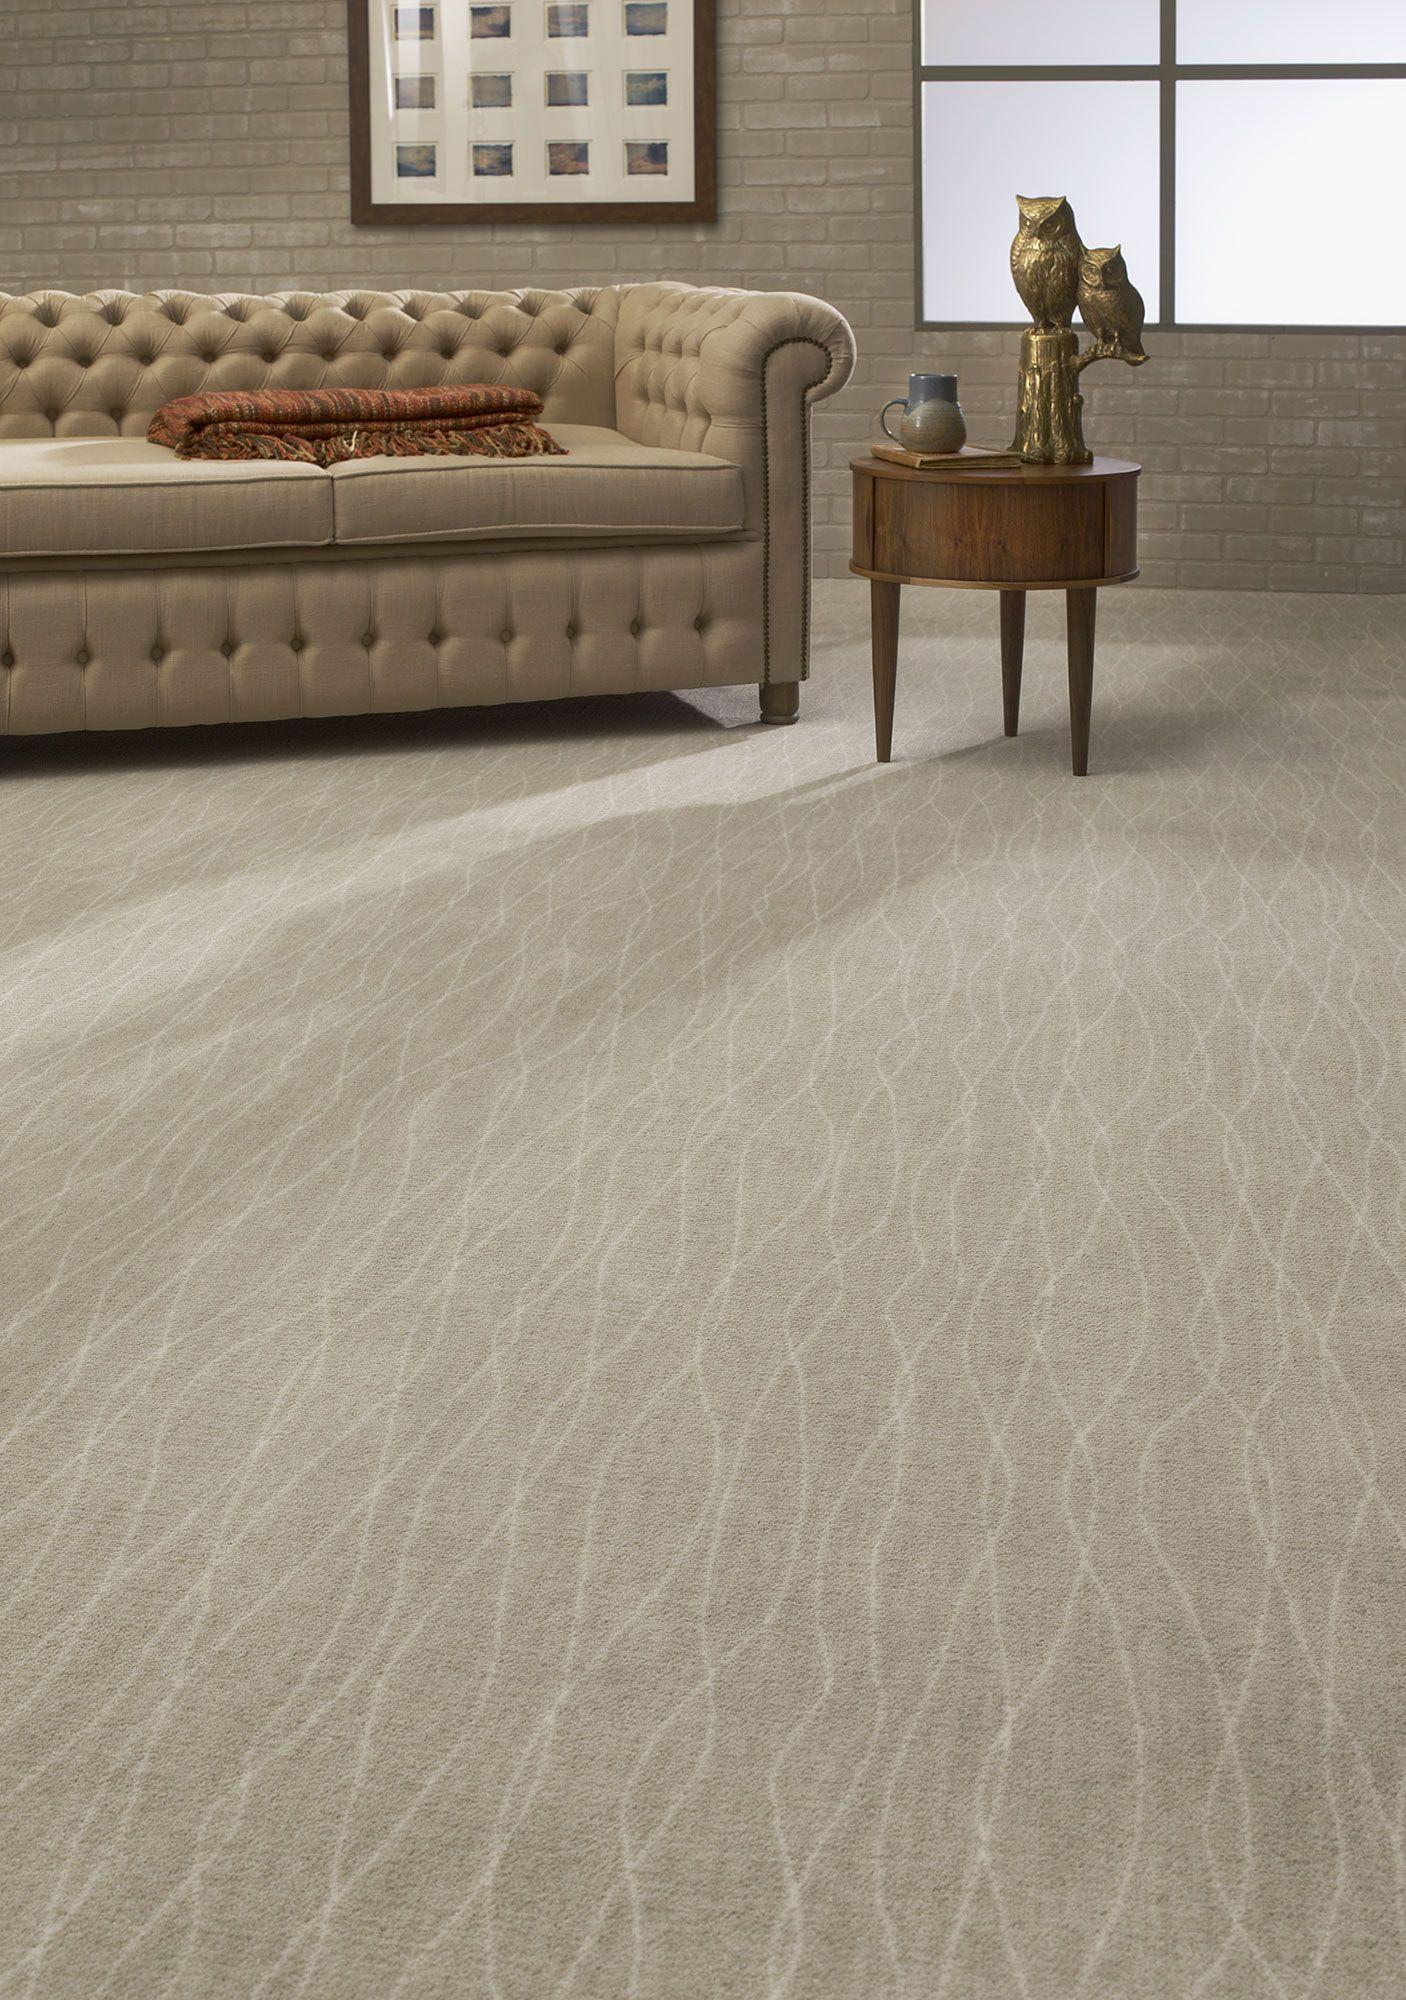 Organic Waves Pattern Neutral Flooring Living Room Ideas